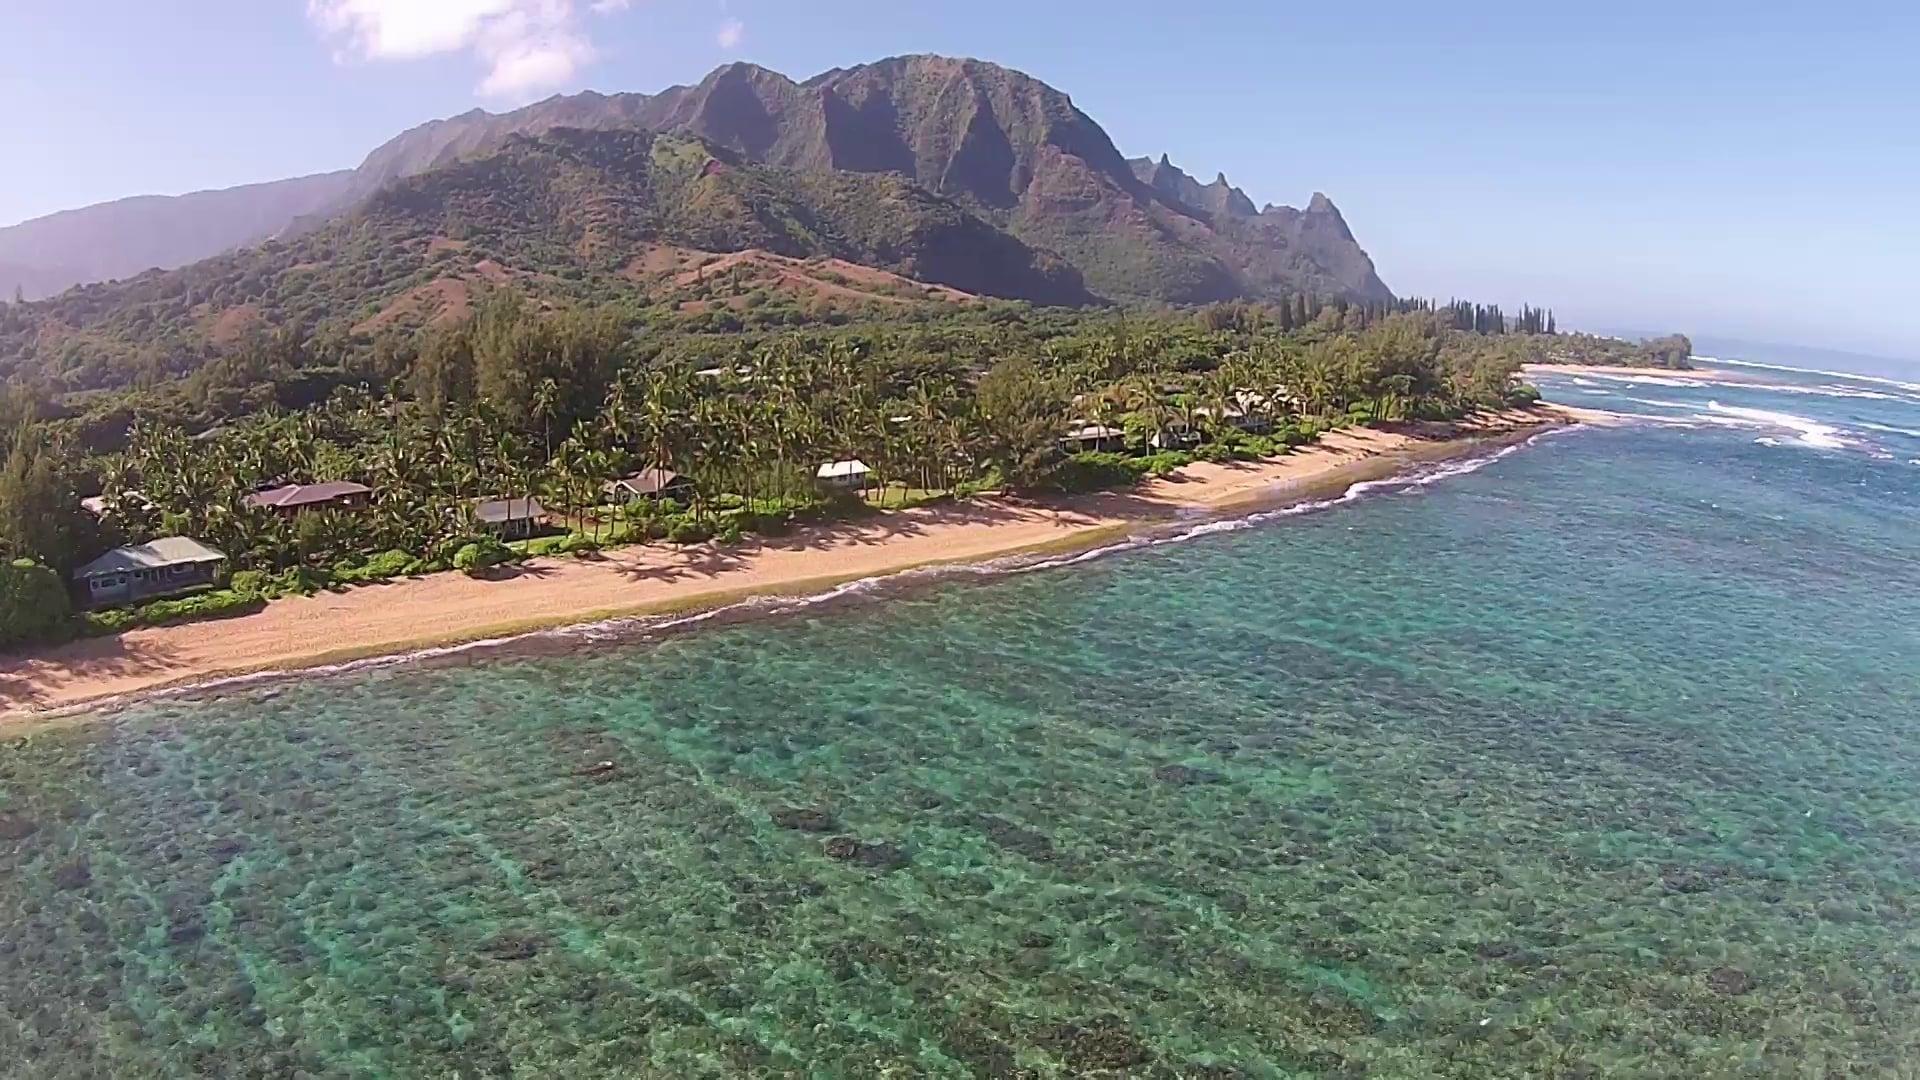 Beach Life - North Shore Kauai